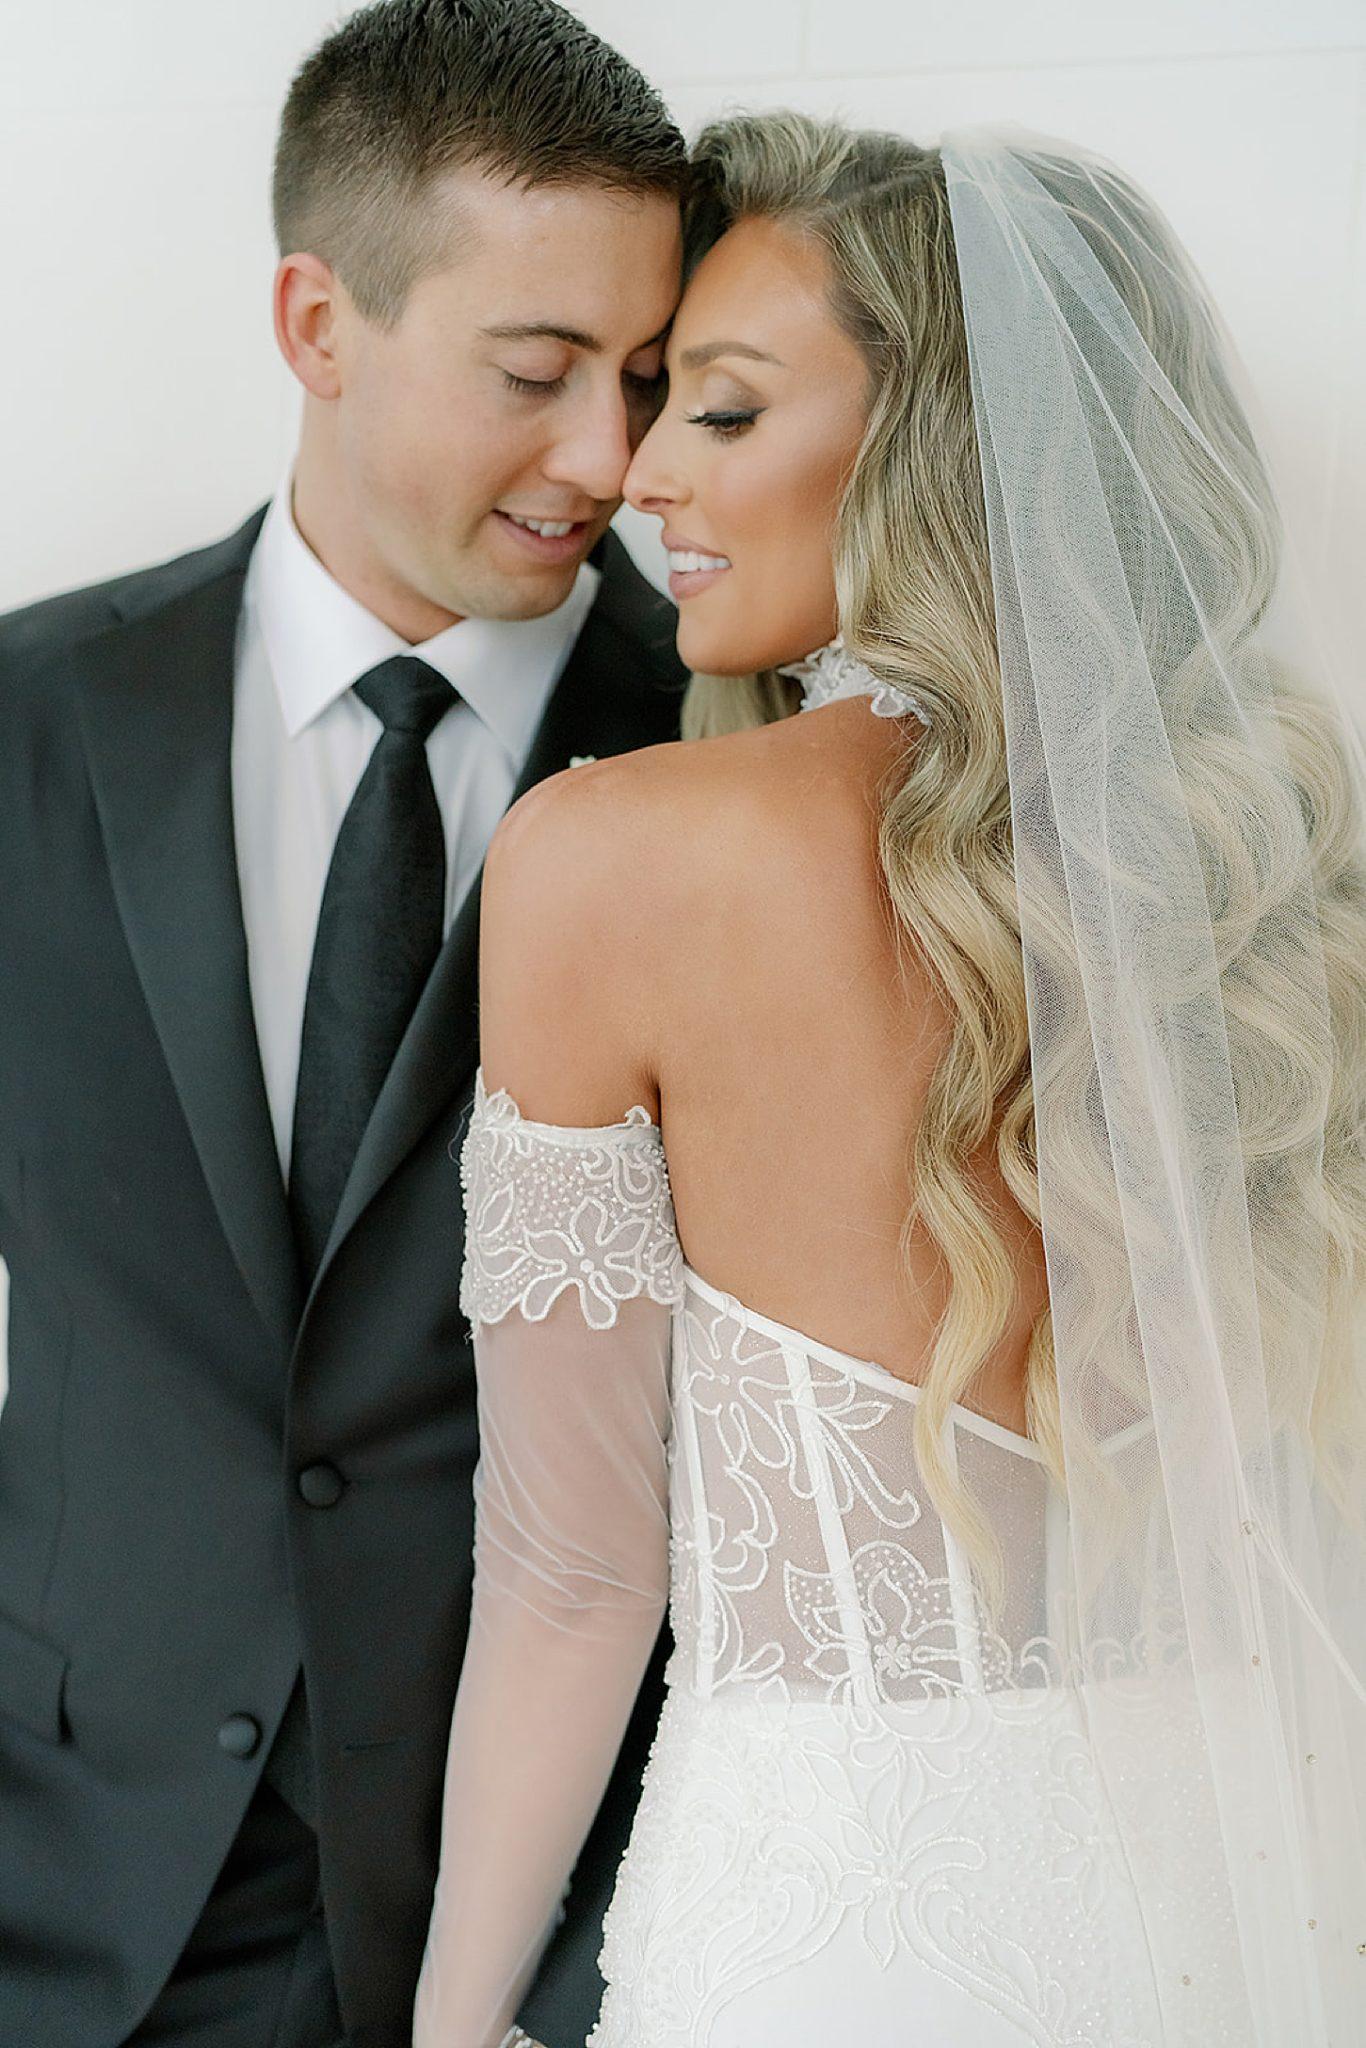 Atlantic City Wedding Photography Studio by Magdalena Studios Lexy Cha 0059 scaled